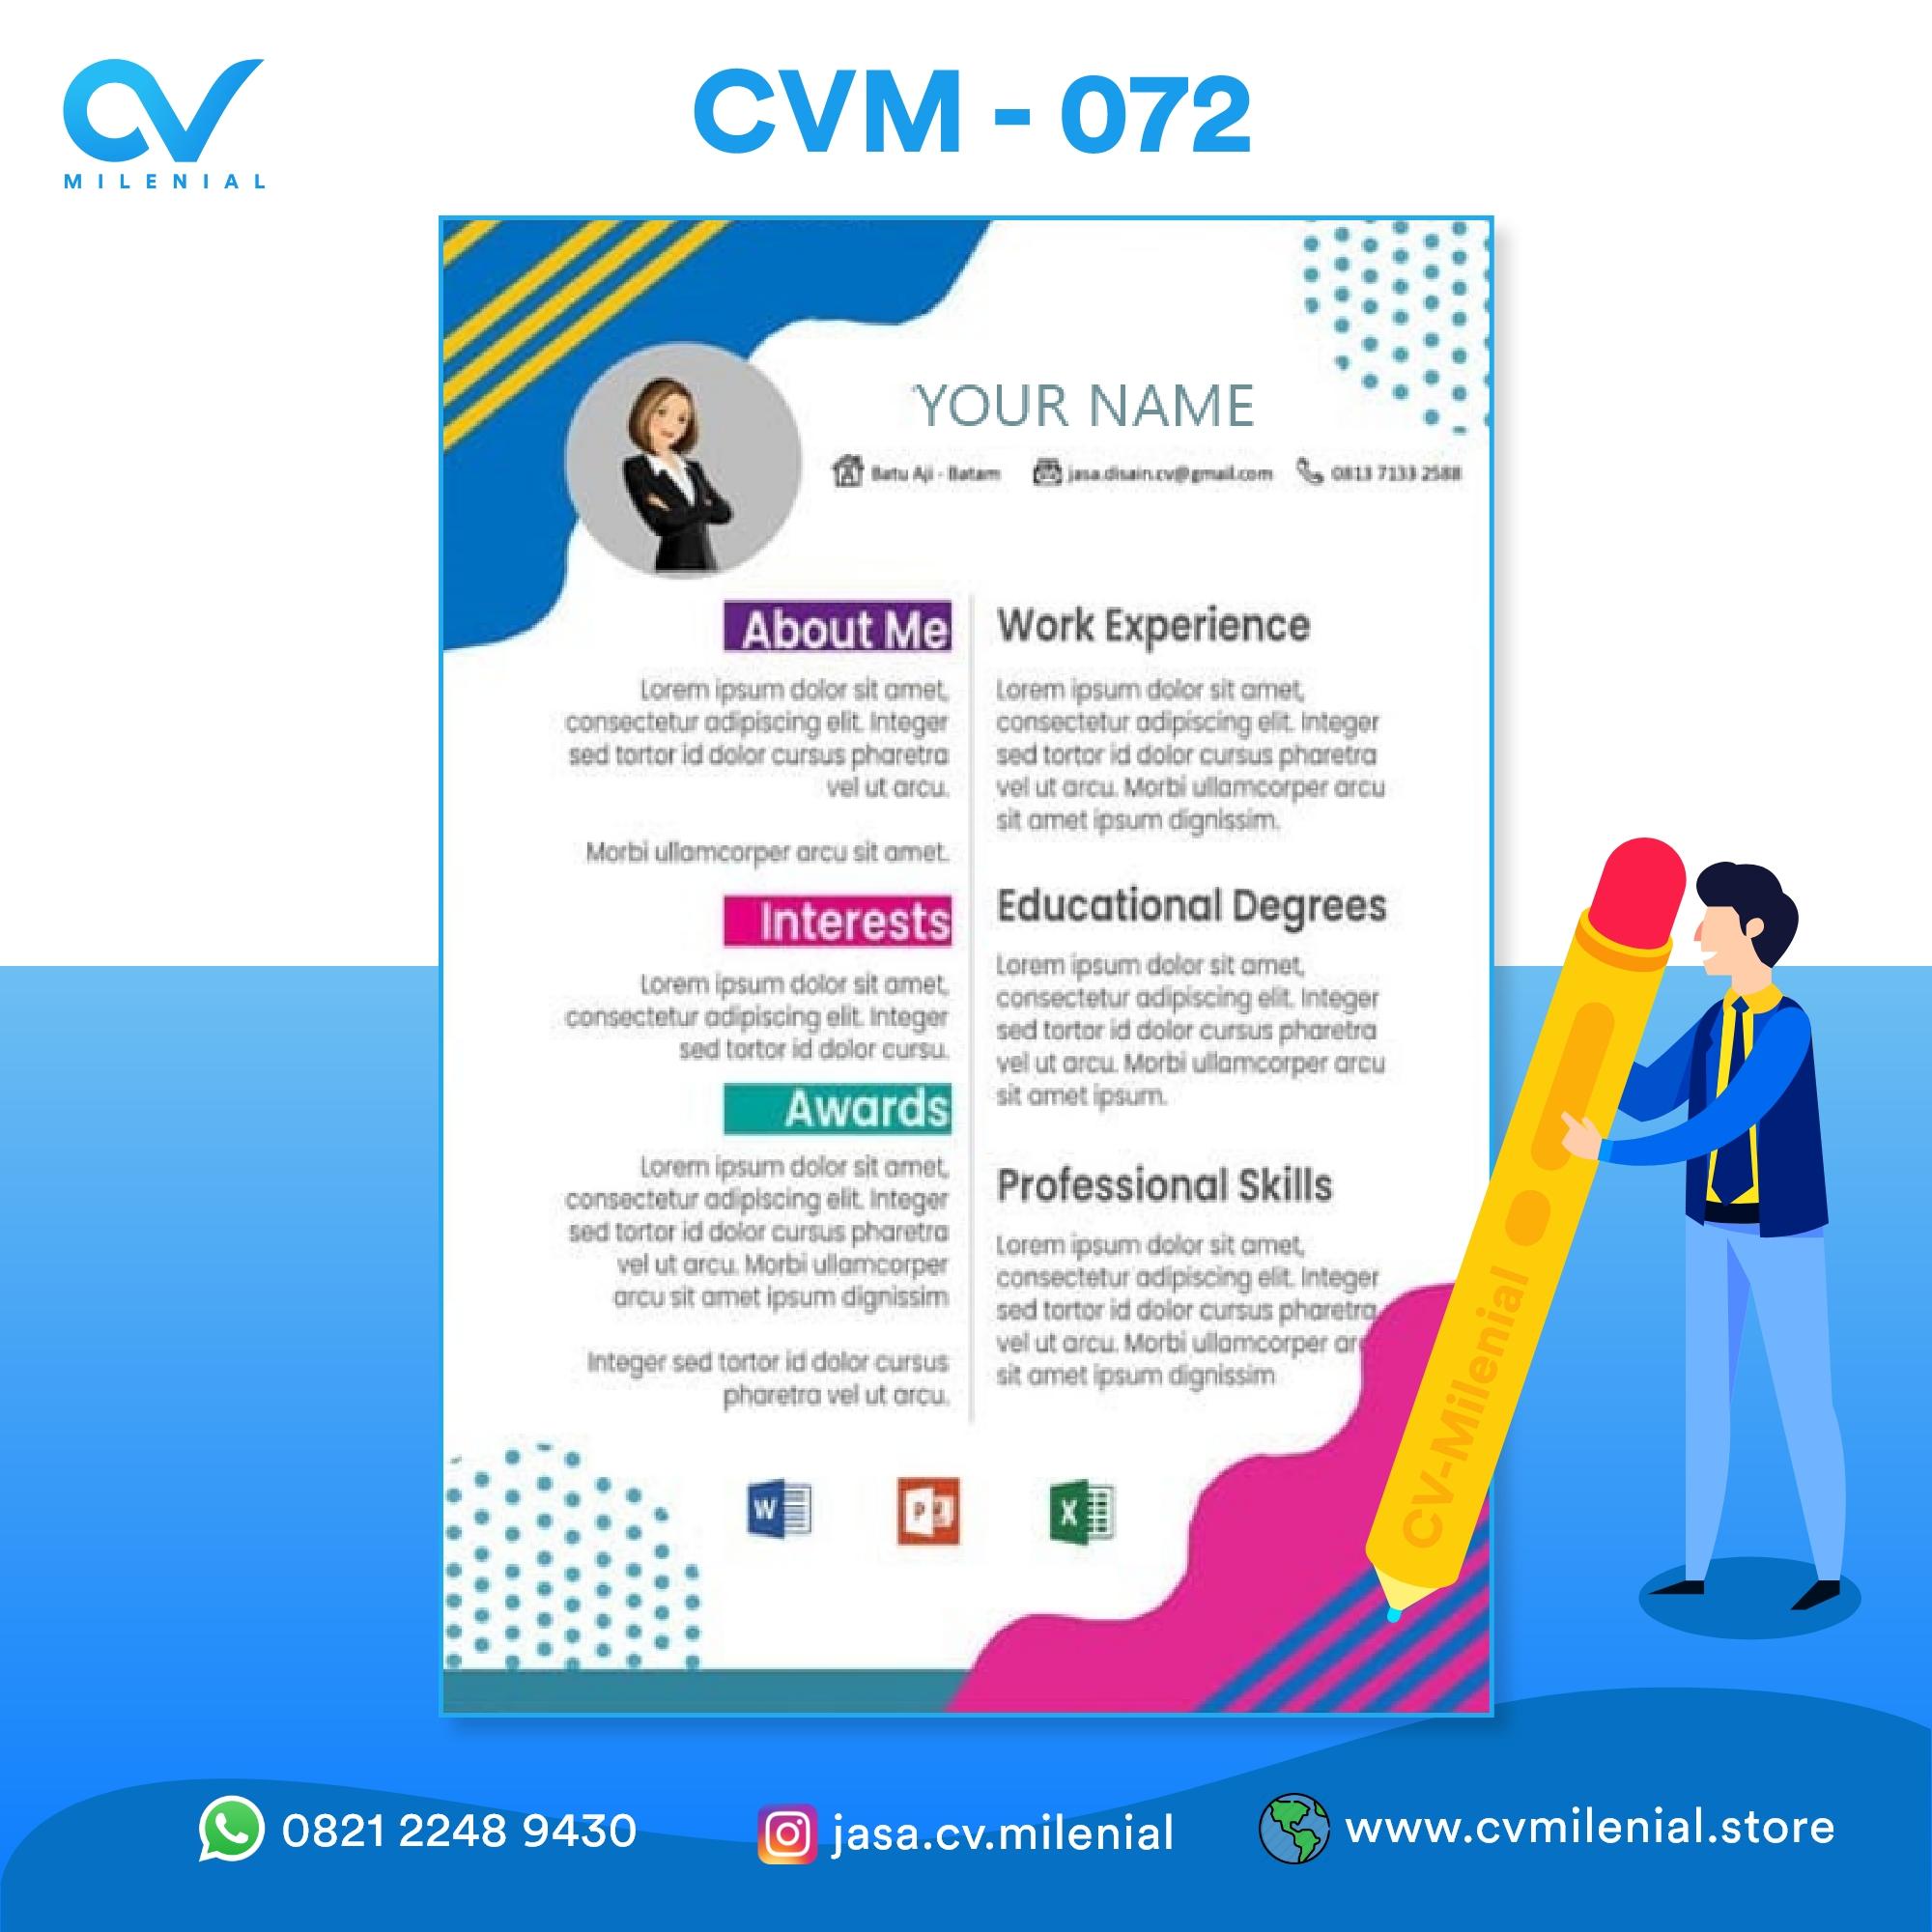 https://cvmilenial.com/assets/image/desain_cv/72.jpg